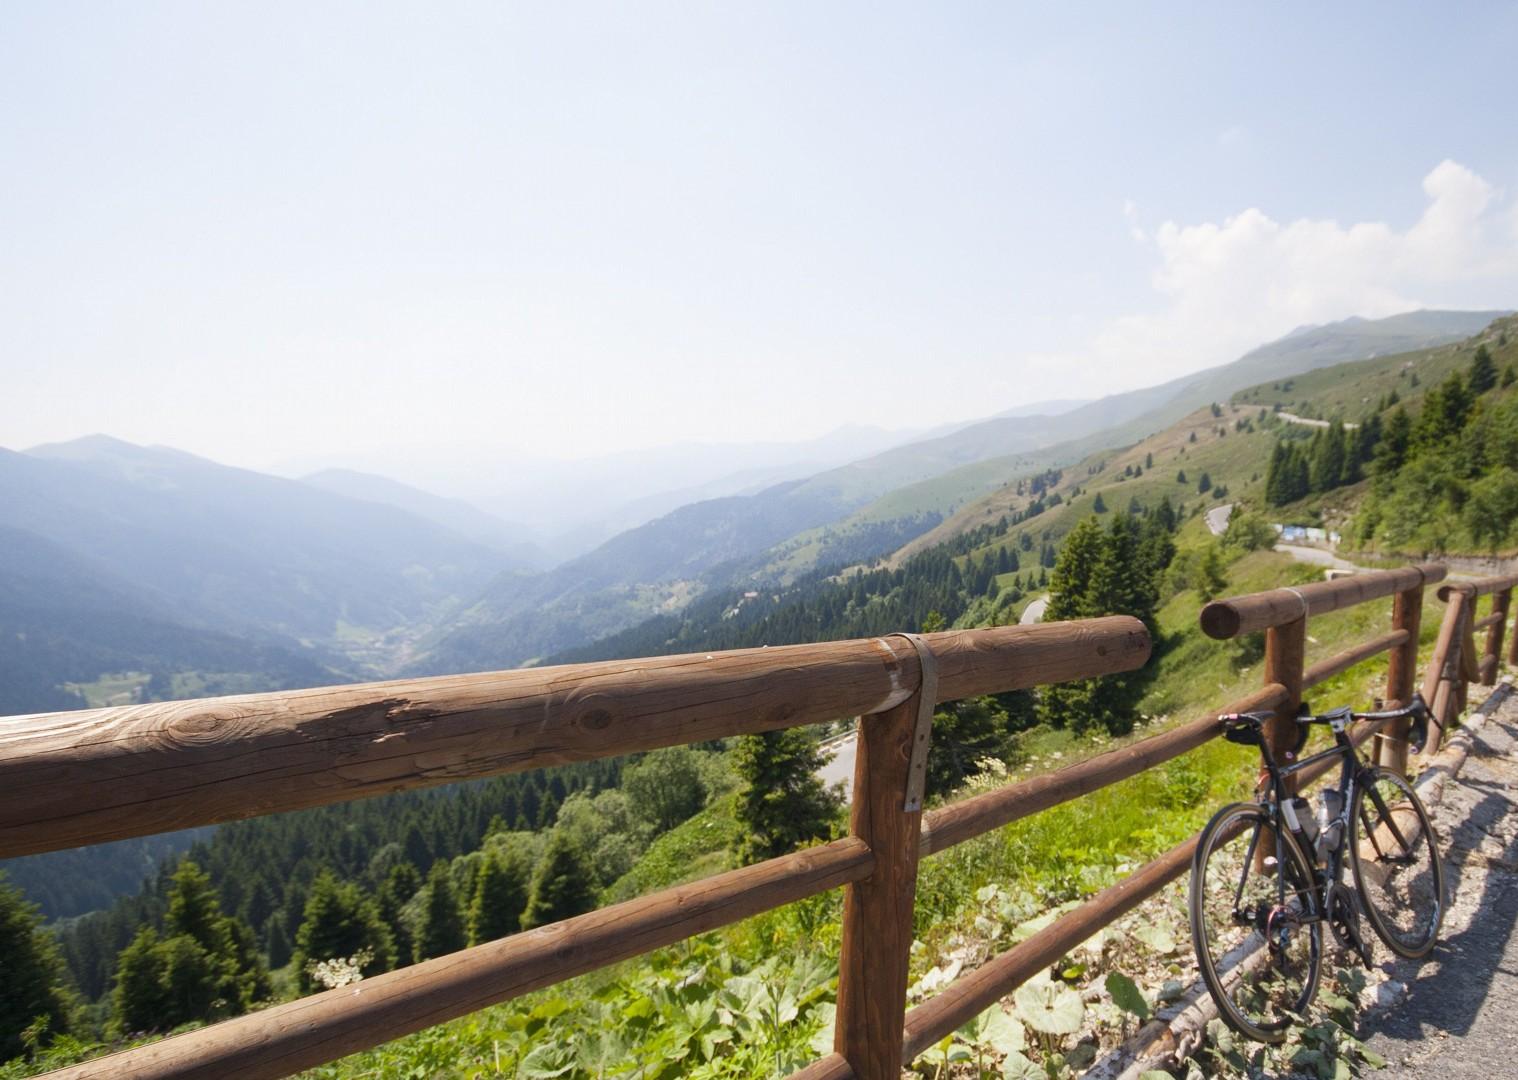 lombardia12.jpg - Italy - Lakes of Lombardia - Guided Road Cycling Holiday - Road Cycling